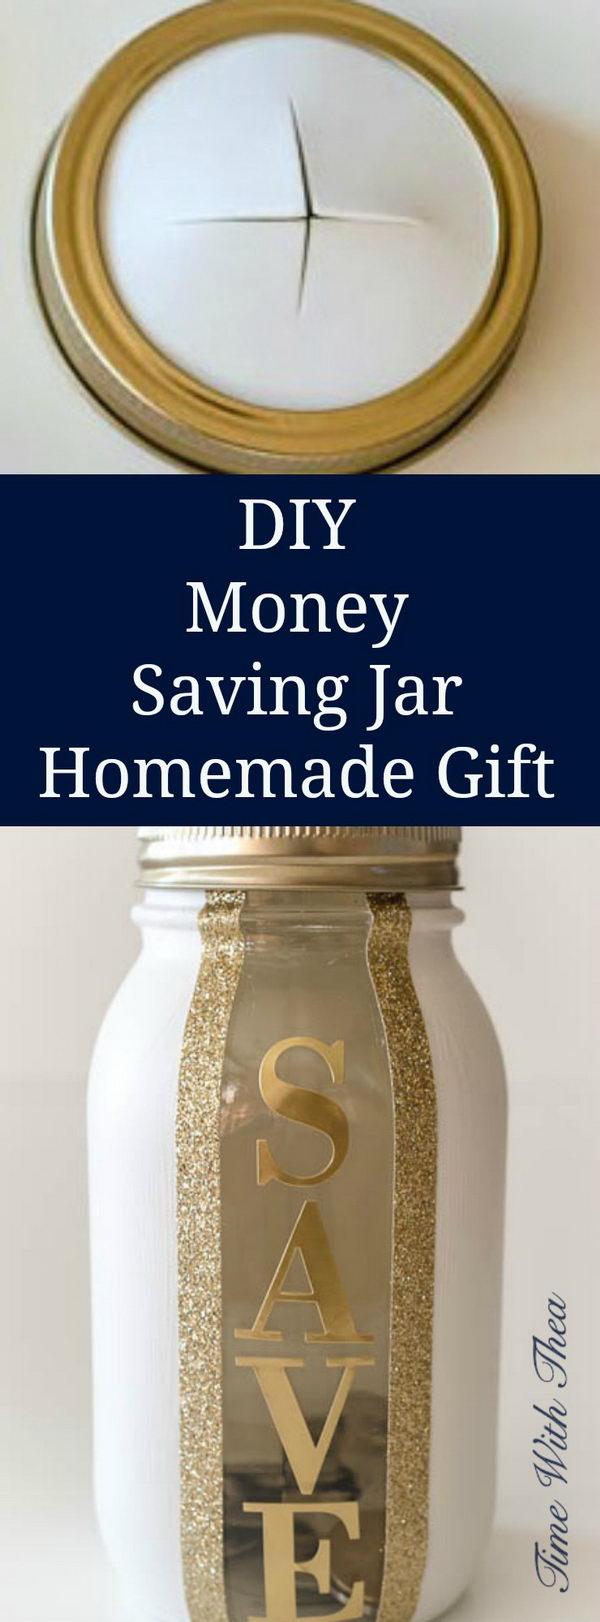 DIY Money Saving Jar Homemade Gift.